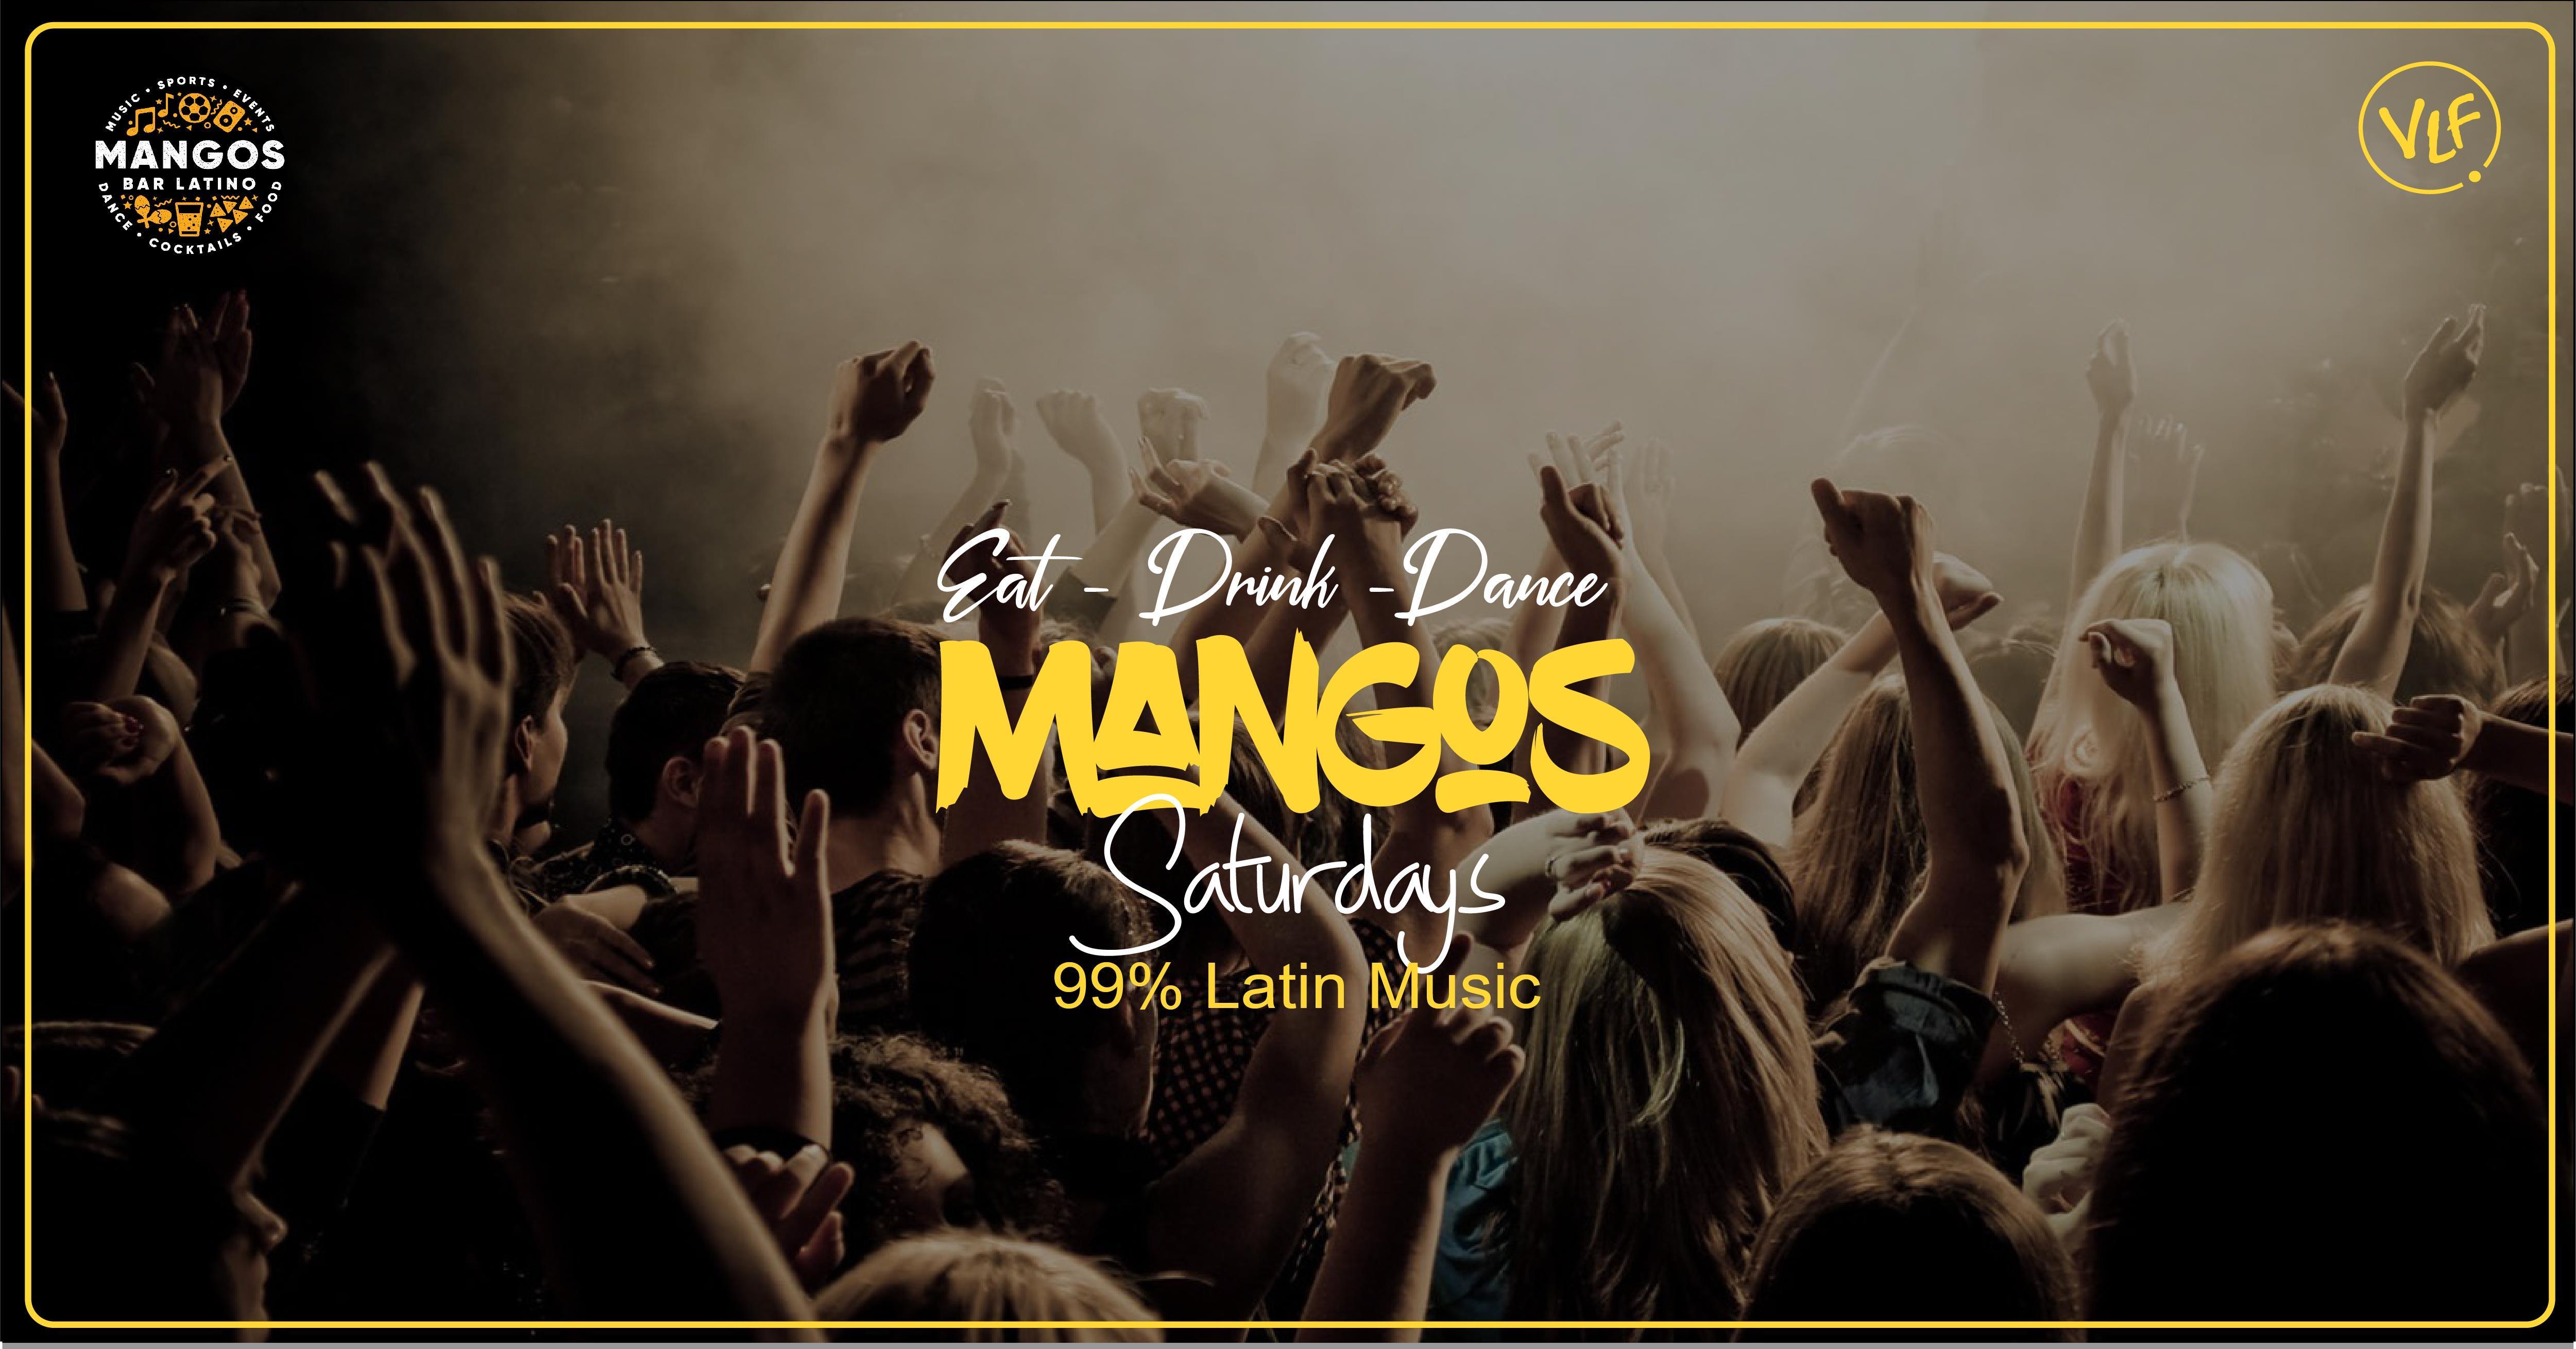 Mangos Saturdays : Vancouver Salsa Saturday